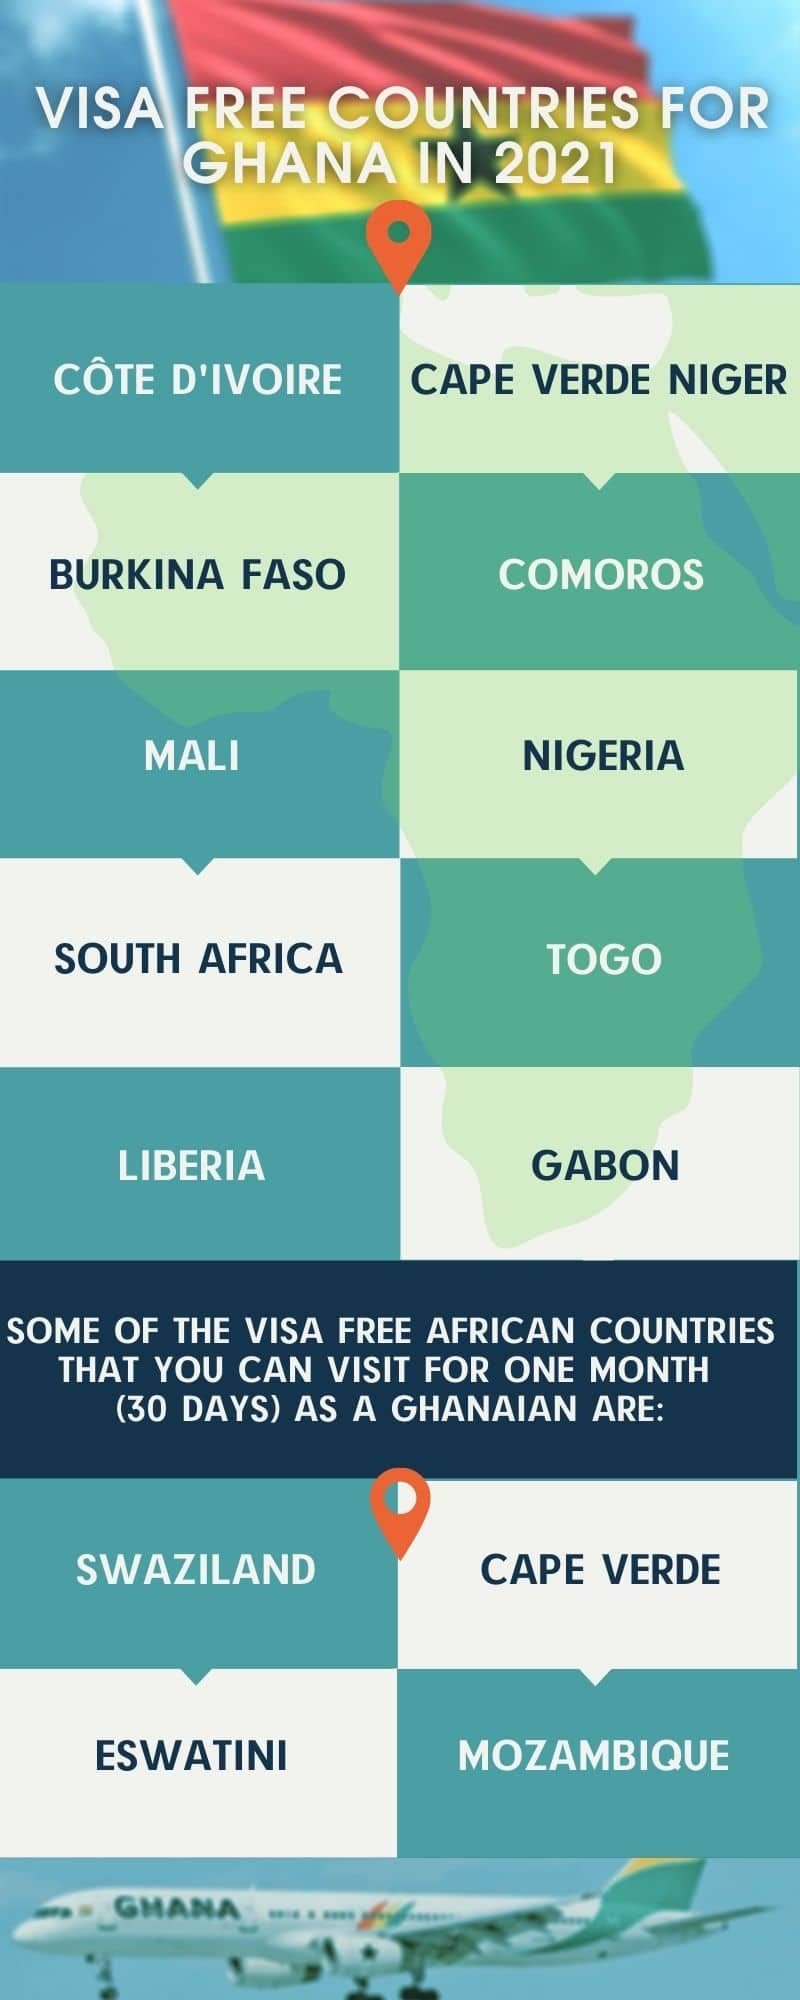 Visa free countries for Ghana